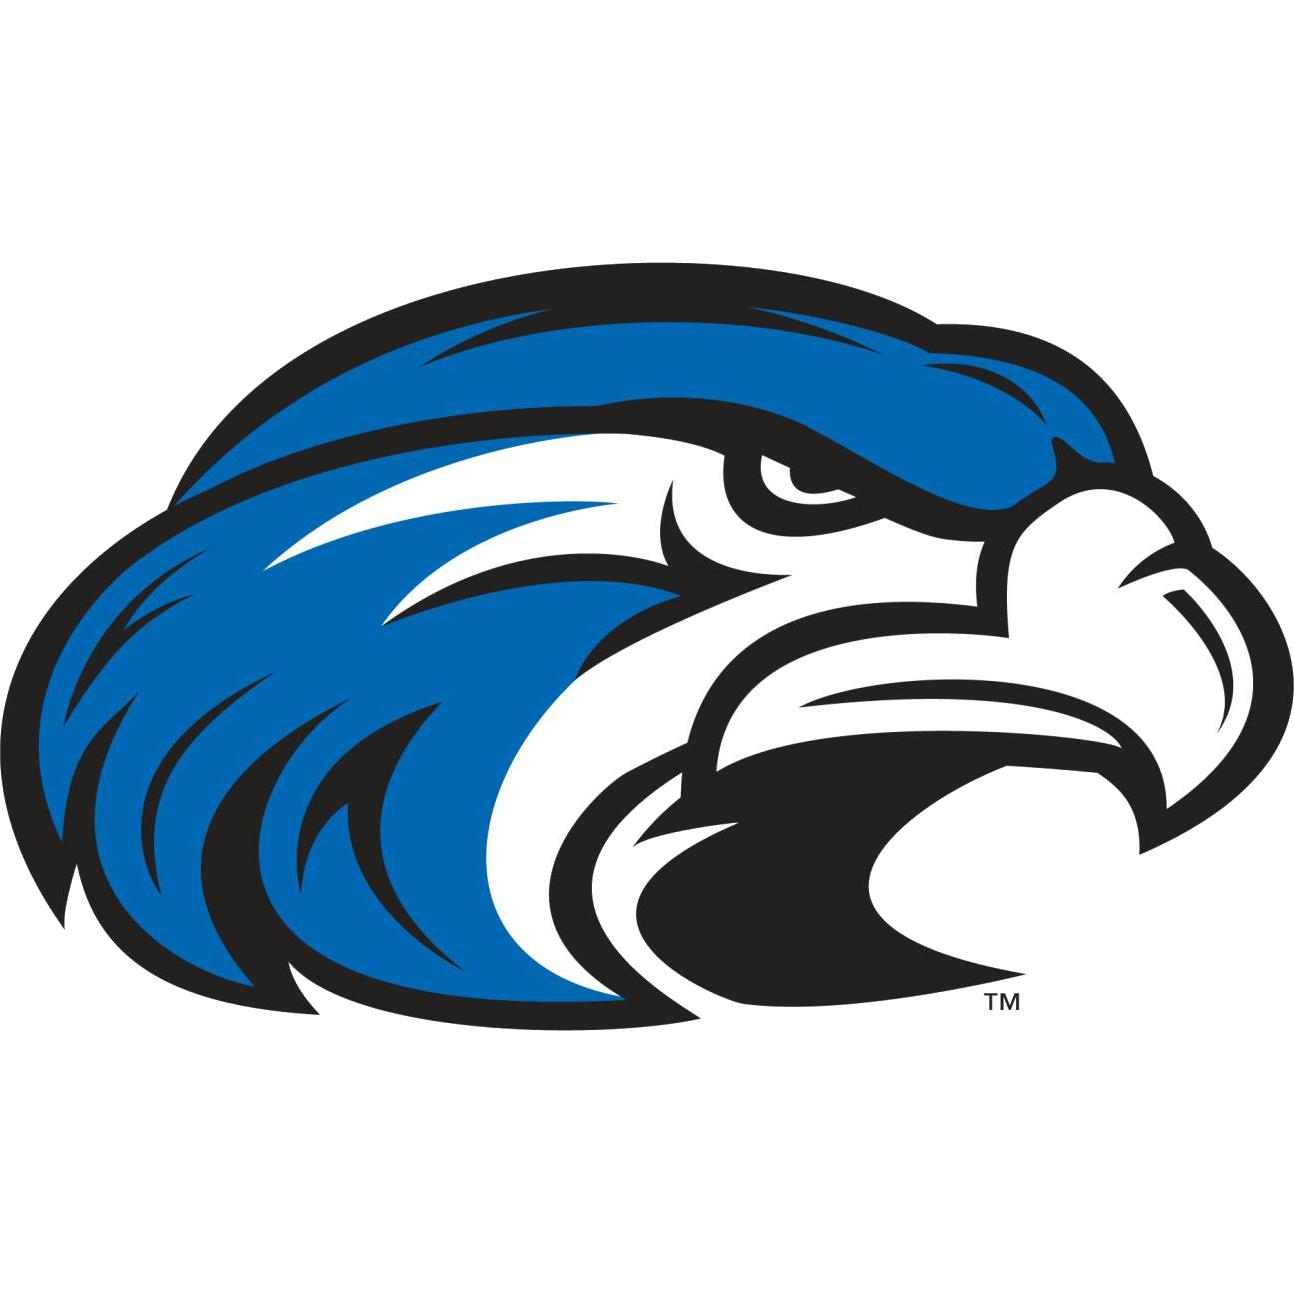 Hawk shorter university